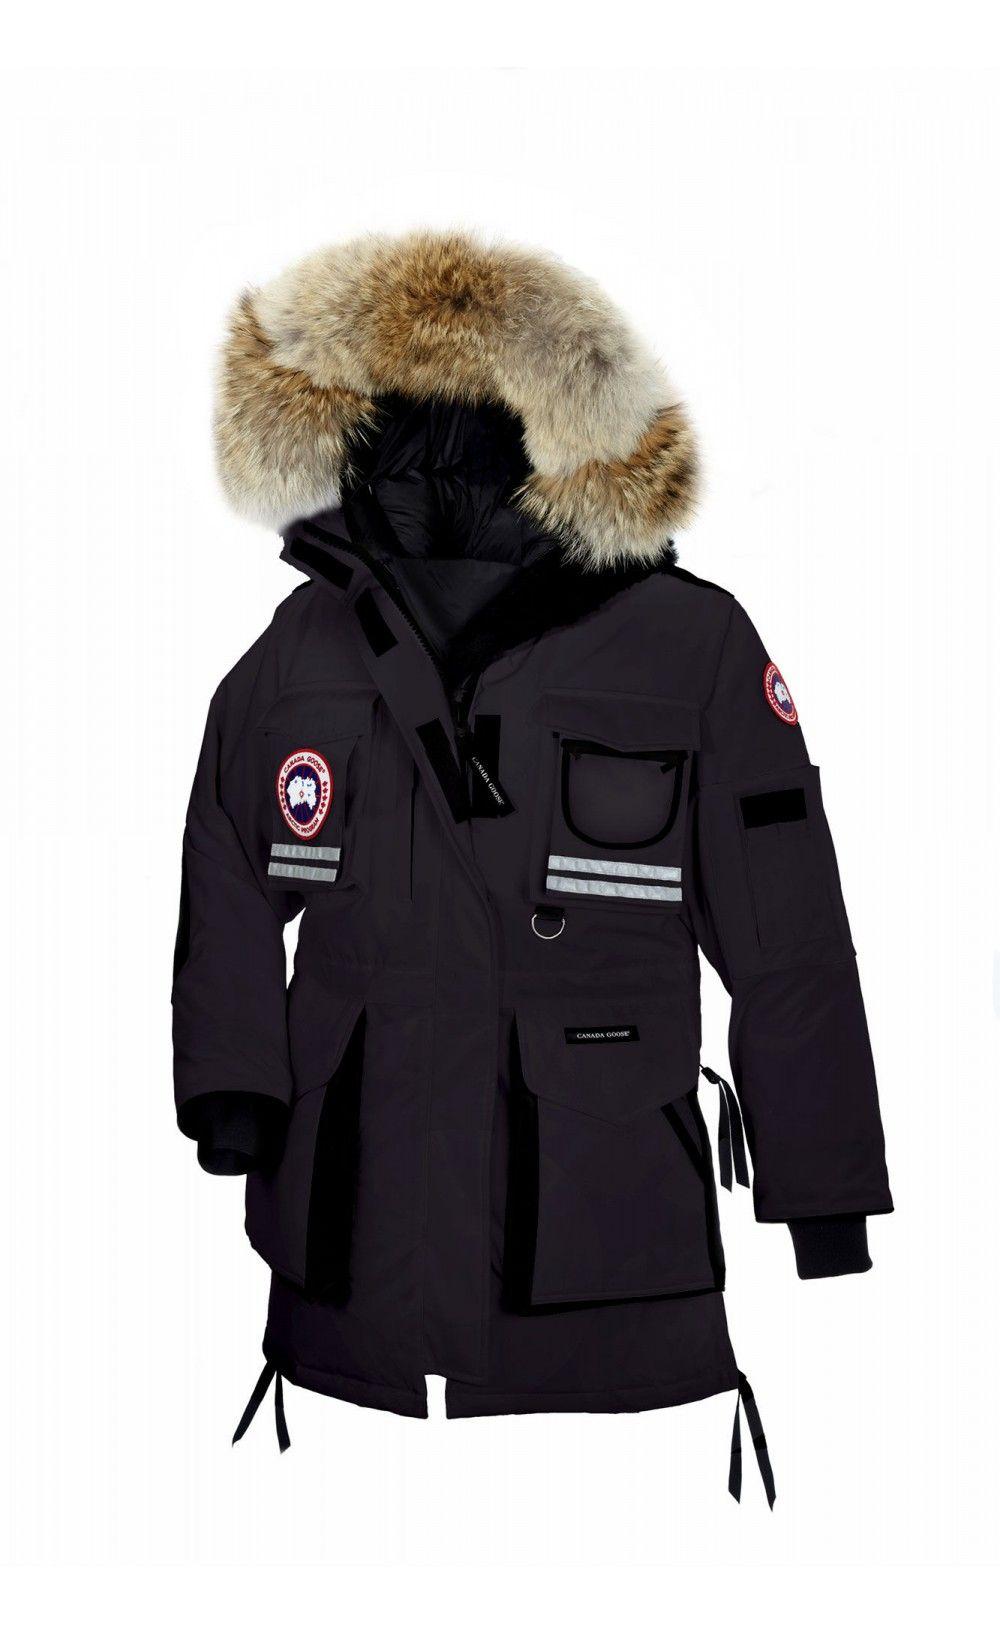 59cf74992c9 Canada Goose Snow Mantra Parka Black Women - Canada Goose ...